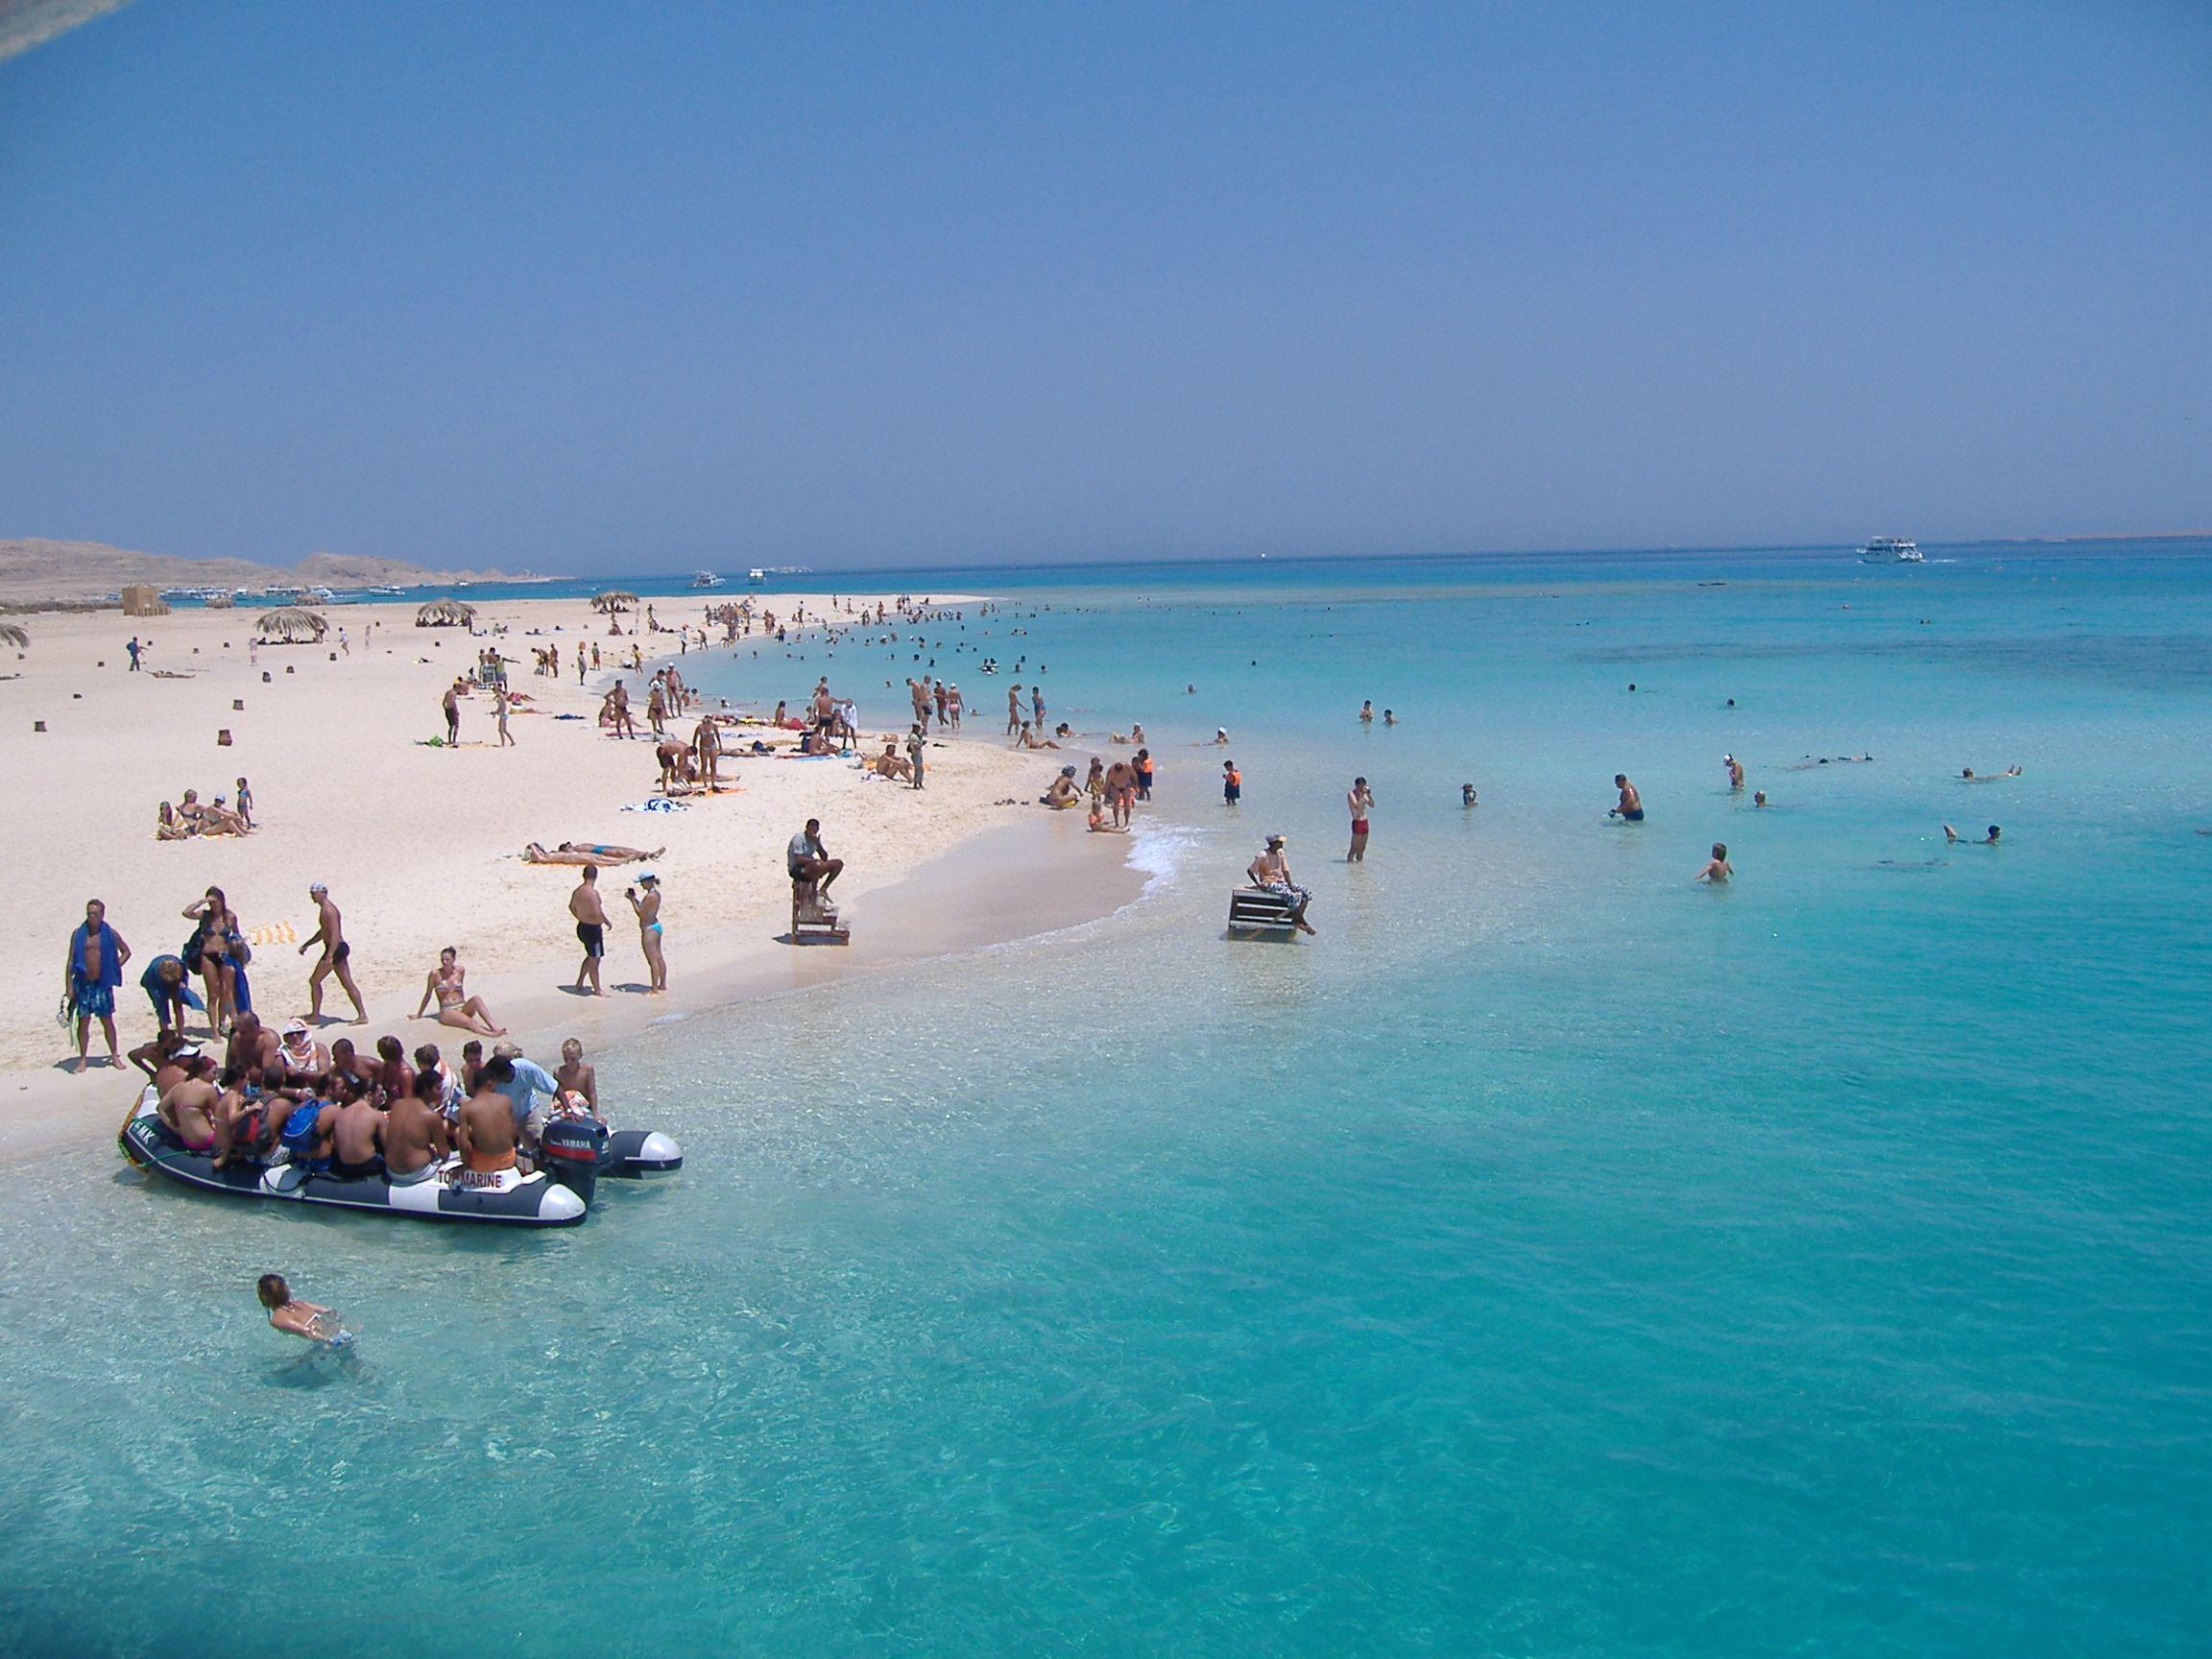 Paradise Island Hurghada Egypt Hurghada Egypt Visit Egypt Places In Egypt